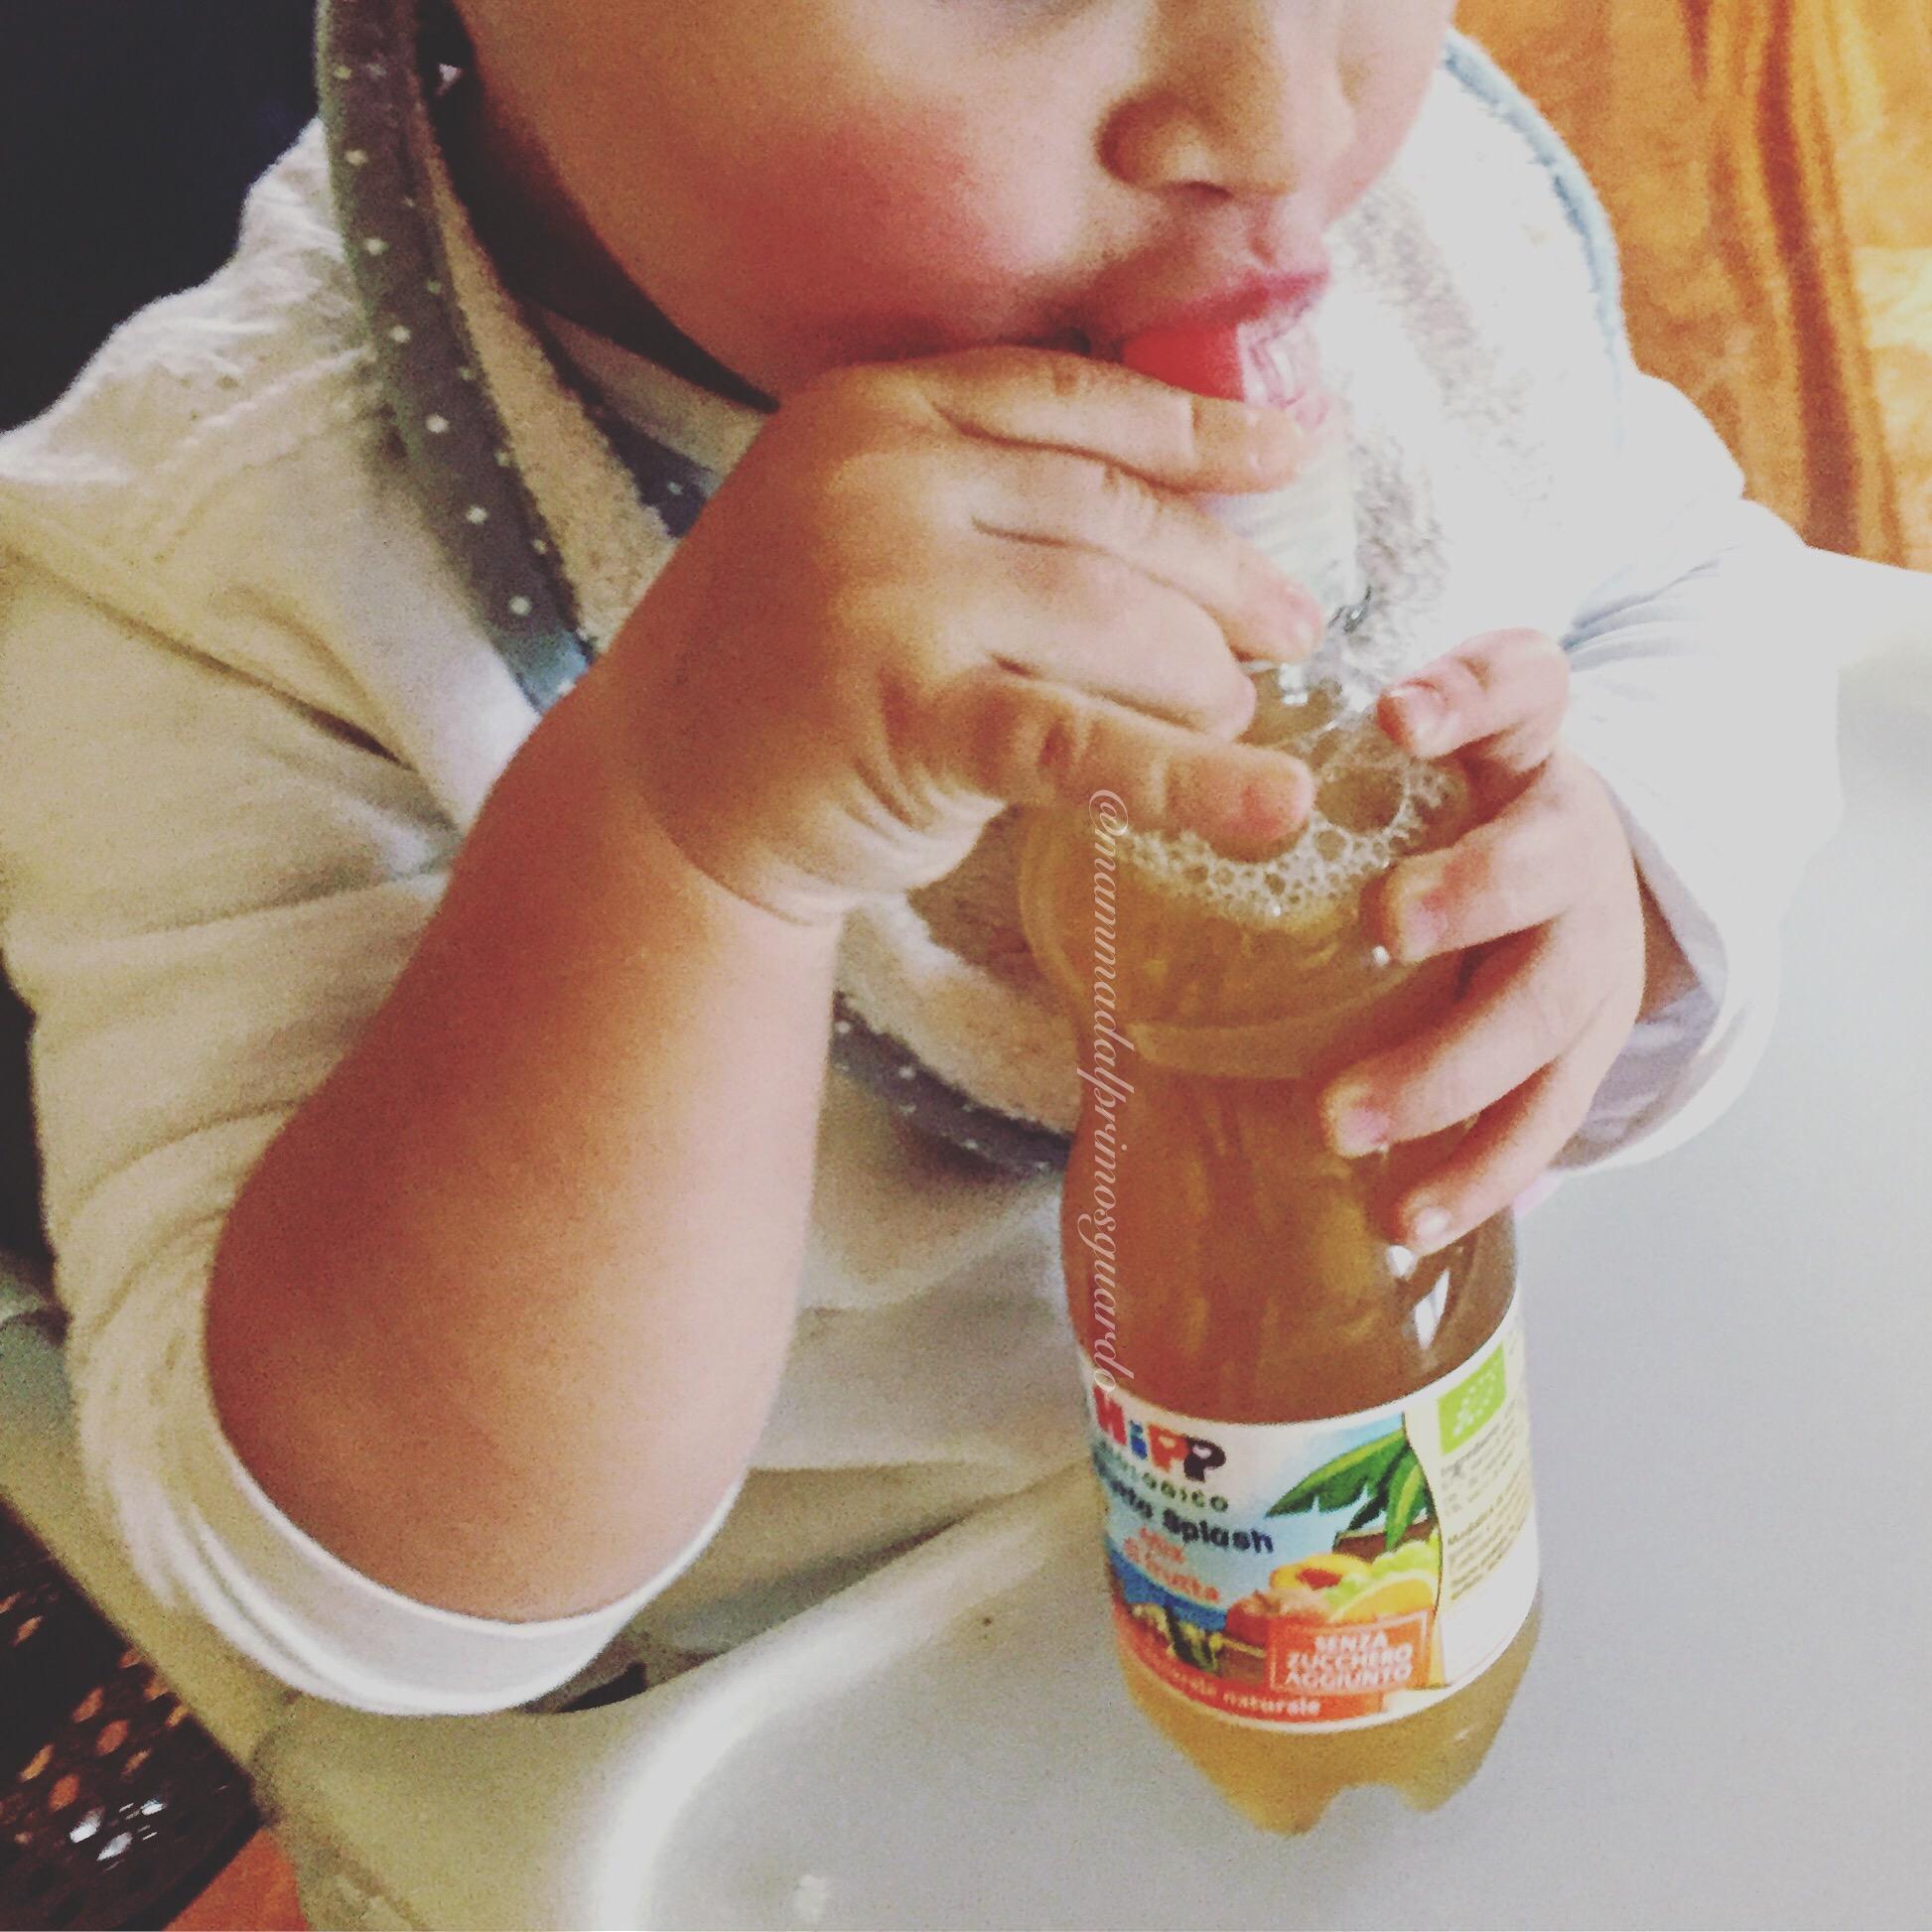 HiPP linea bambini omogeneizzati patatine yogurt